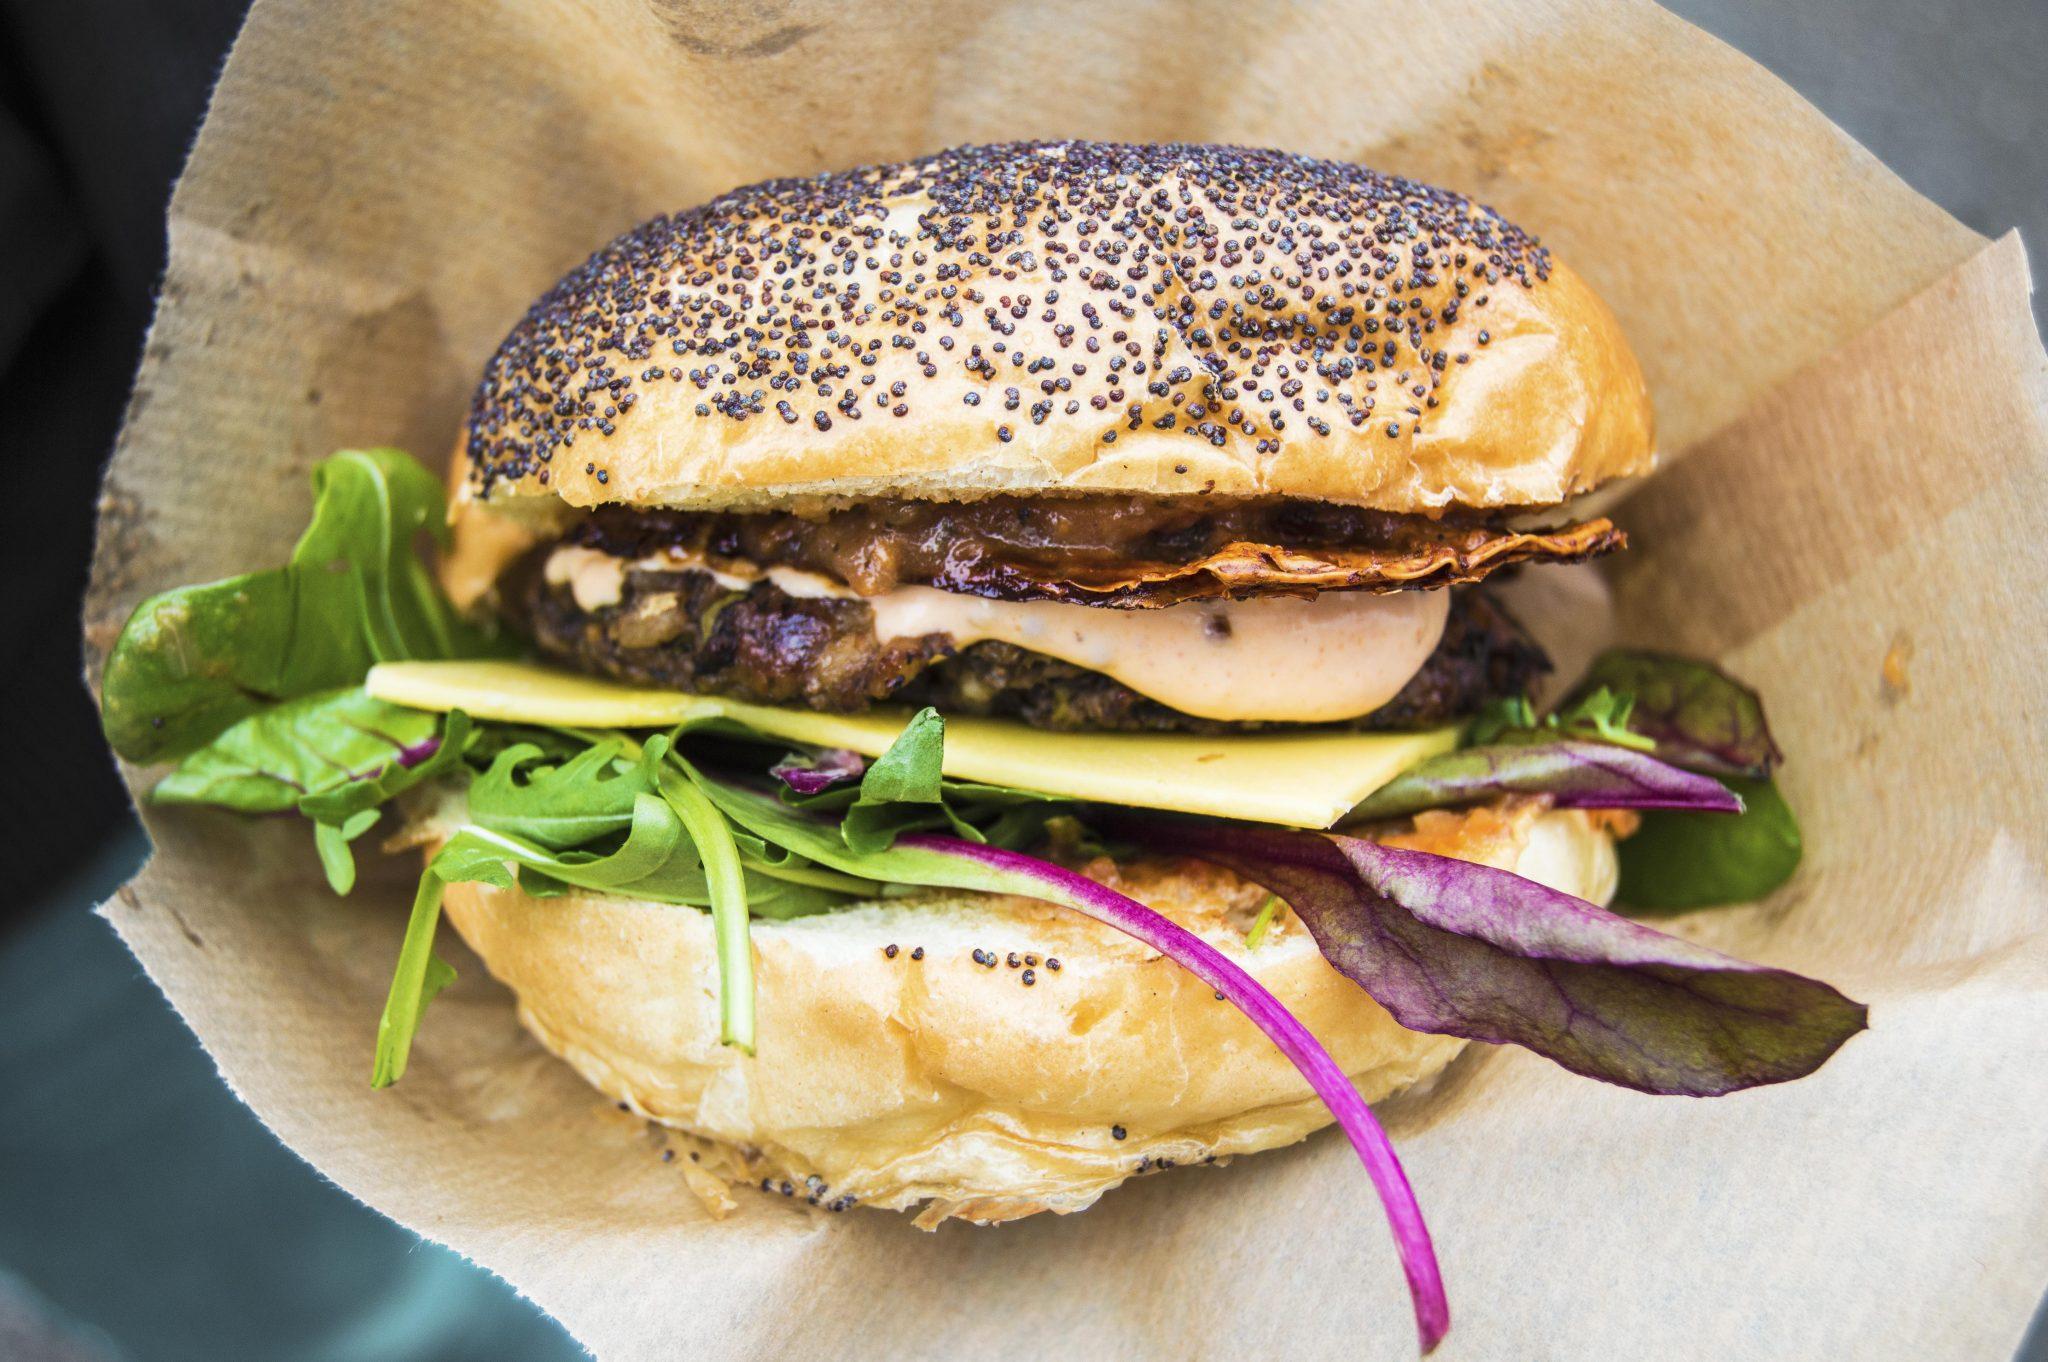 A Vegan In London - New Monthly Vegan Food Market in Hackney!